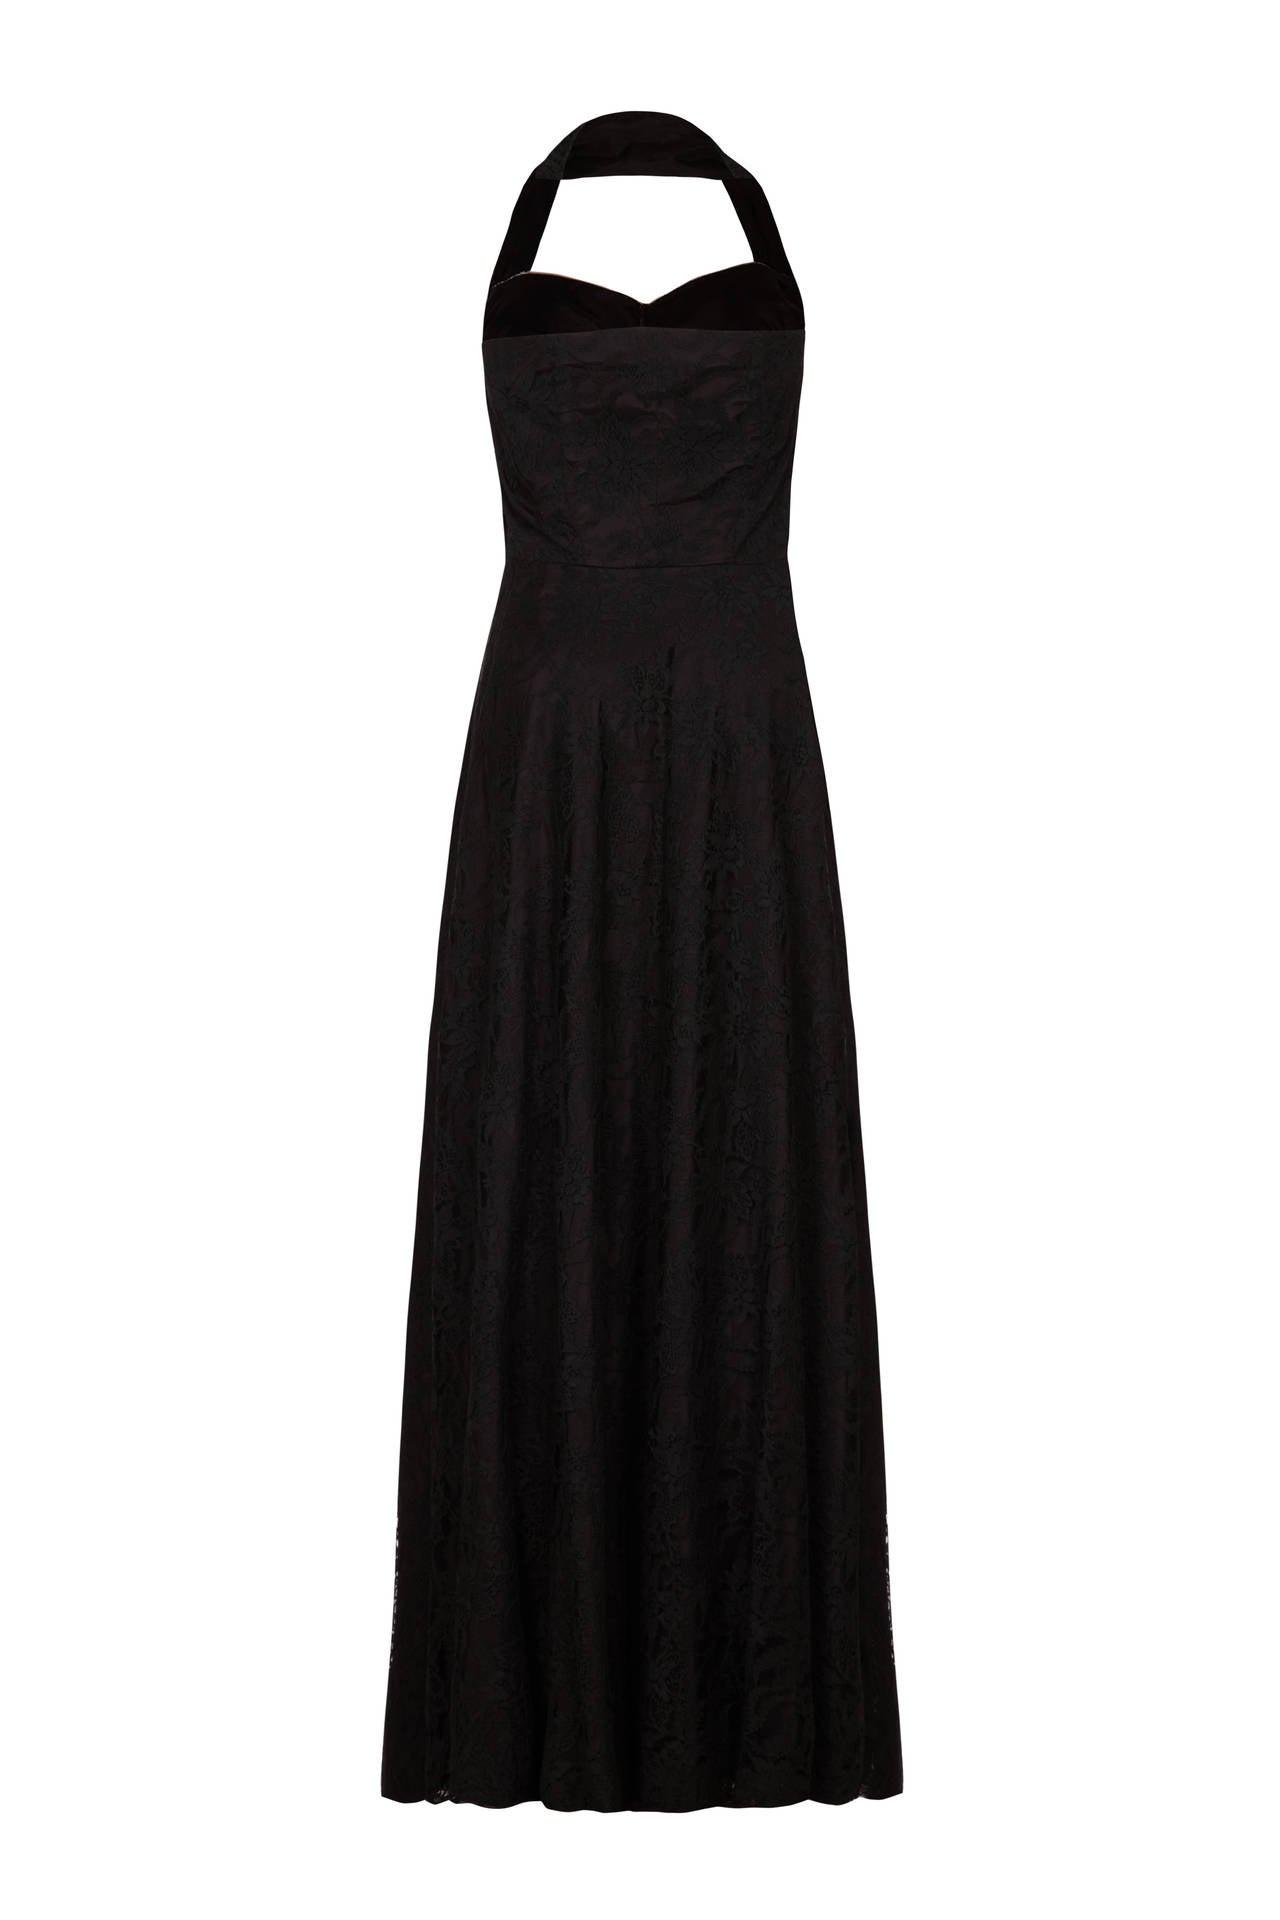 1950s Black Lace & Satin Halter Neck Dress 2